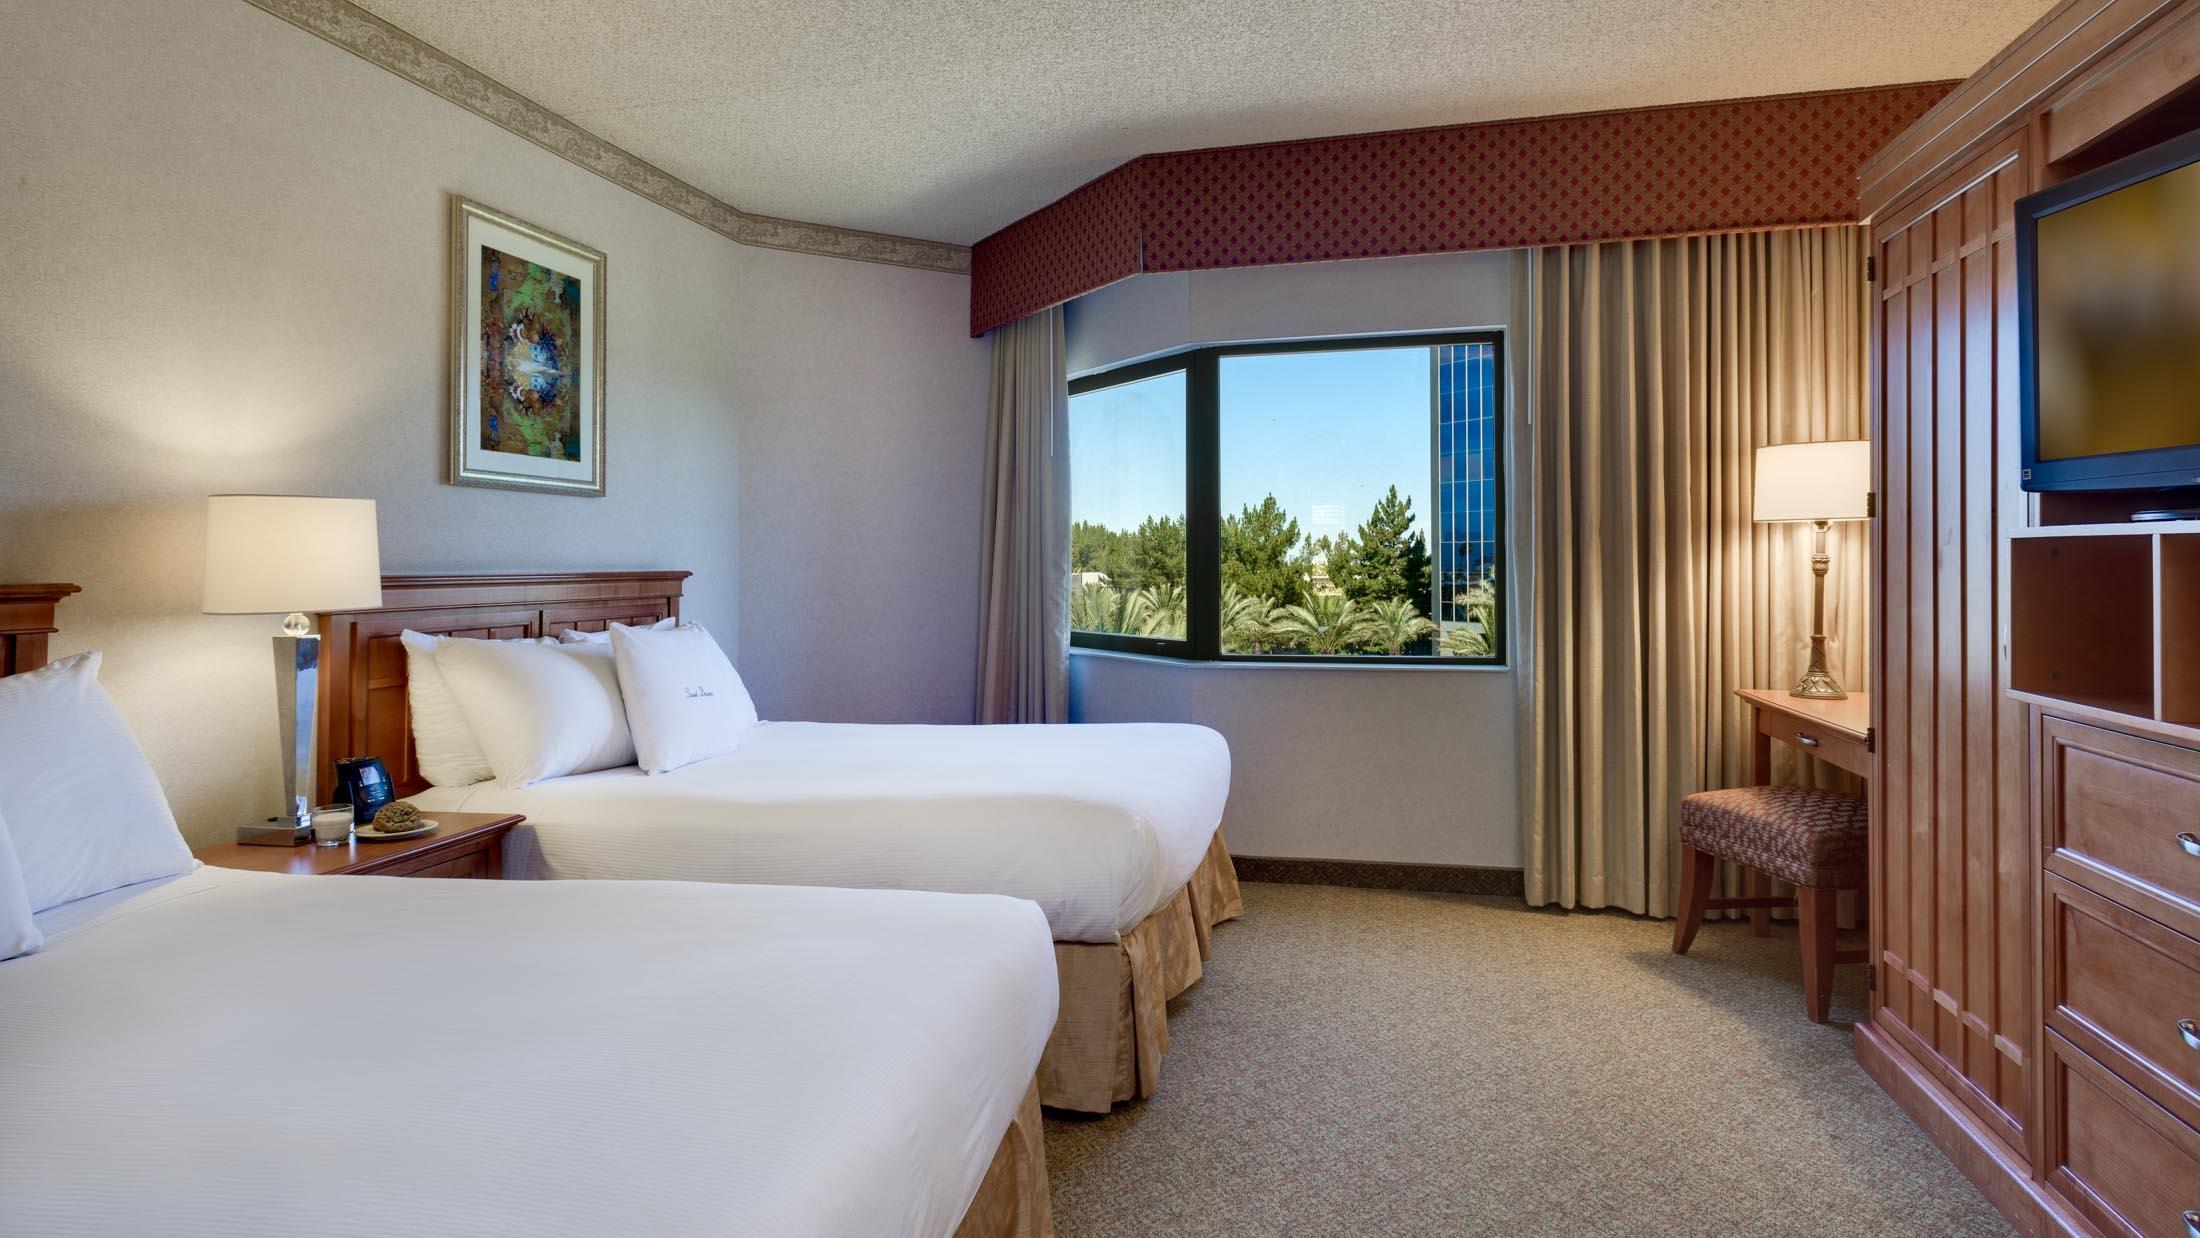 DoubleTree Suites by Hilton Hotel Phoenix image 3